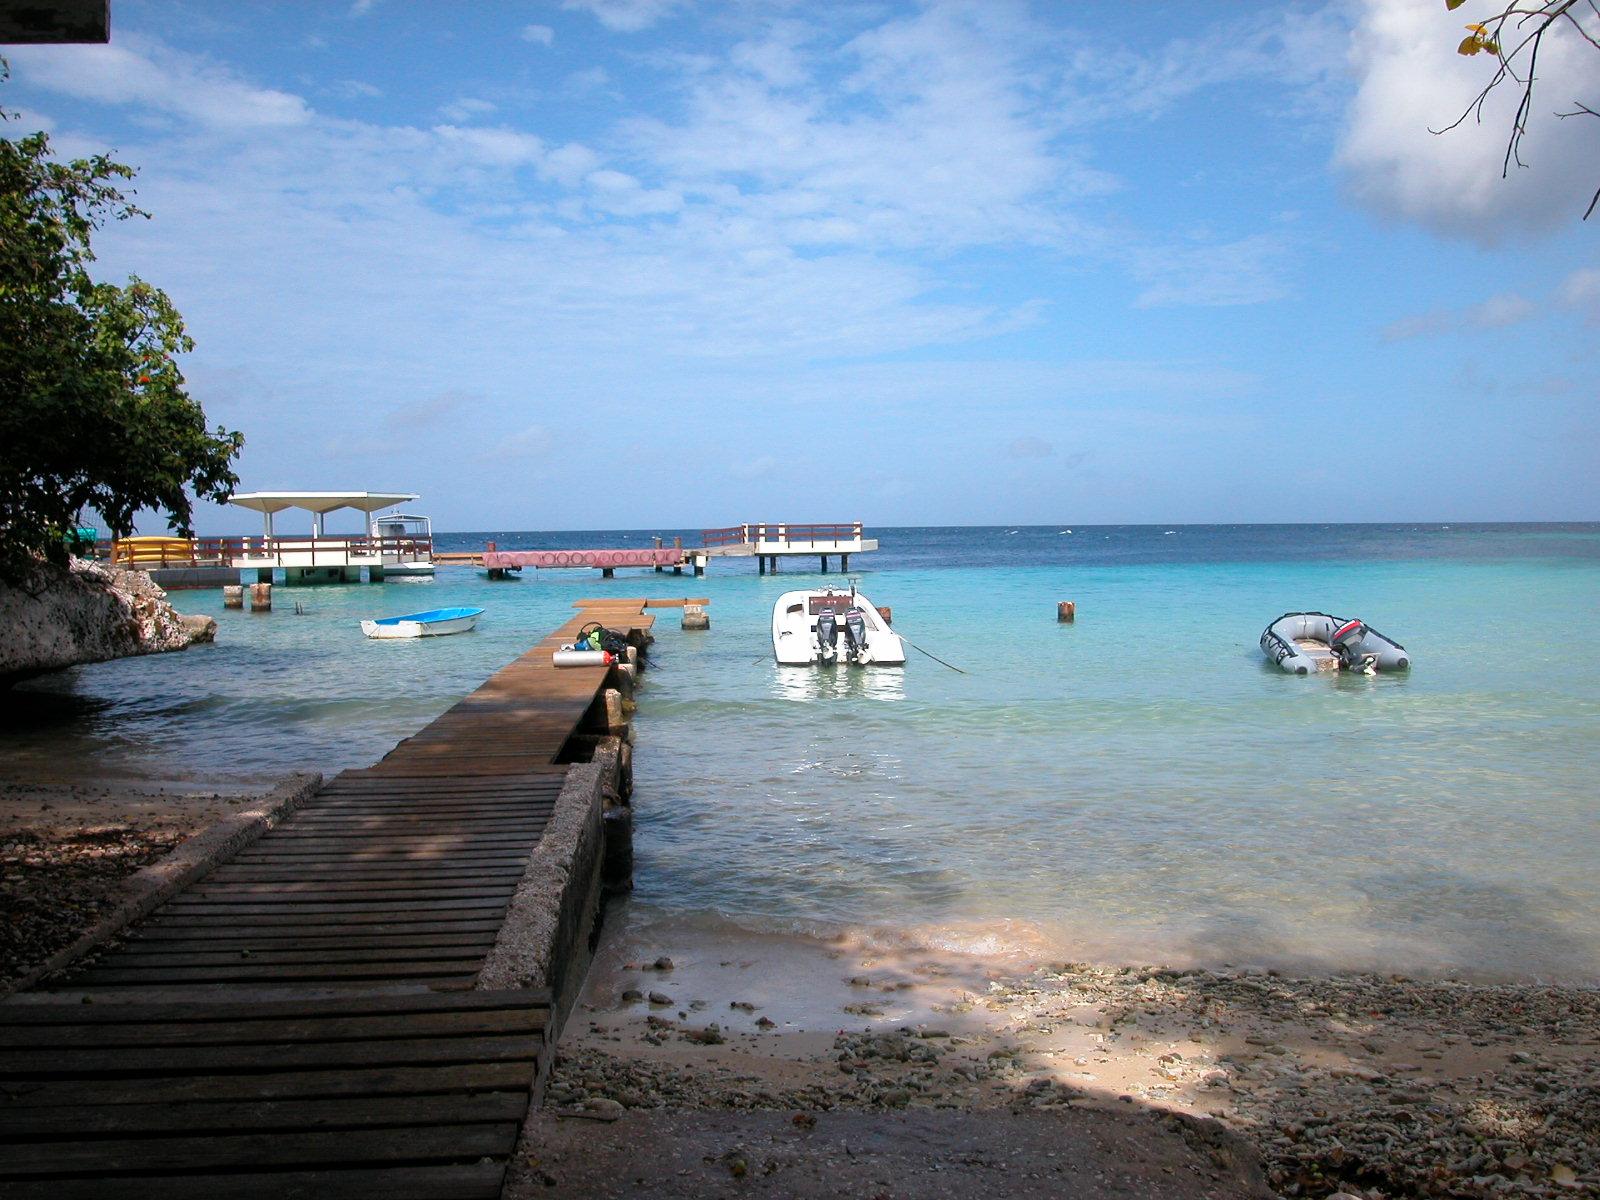 jacco beach pier sea ocean tropical island speed boat speedboat anchored